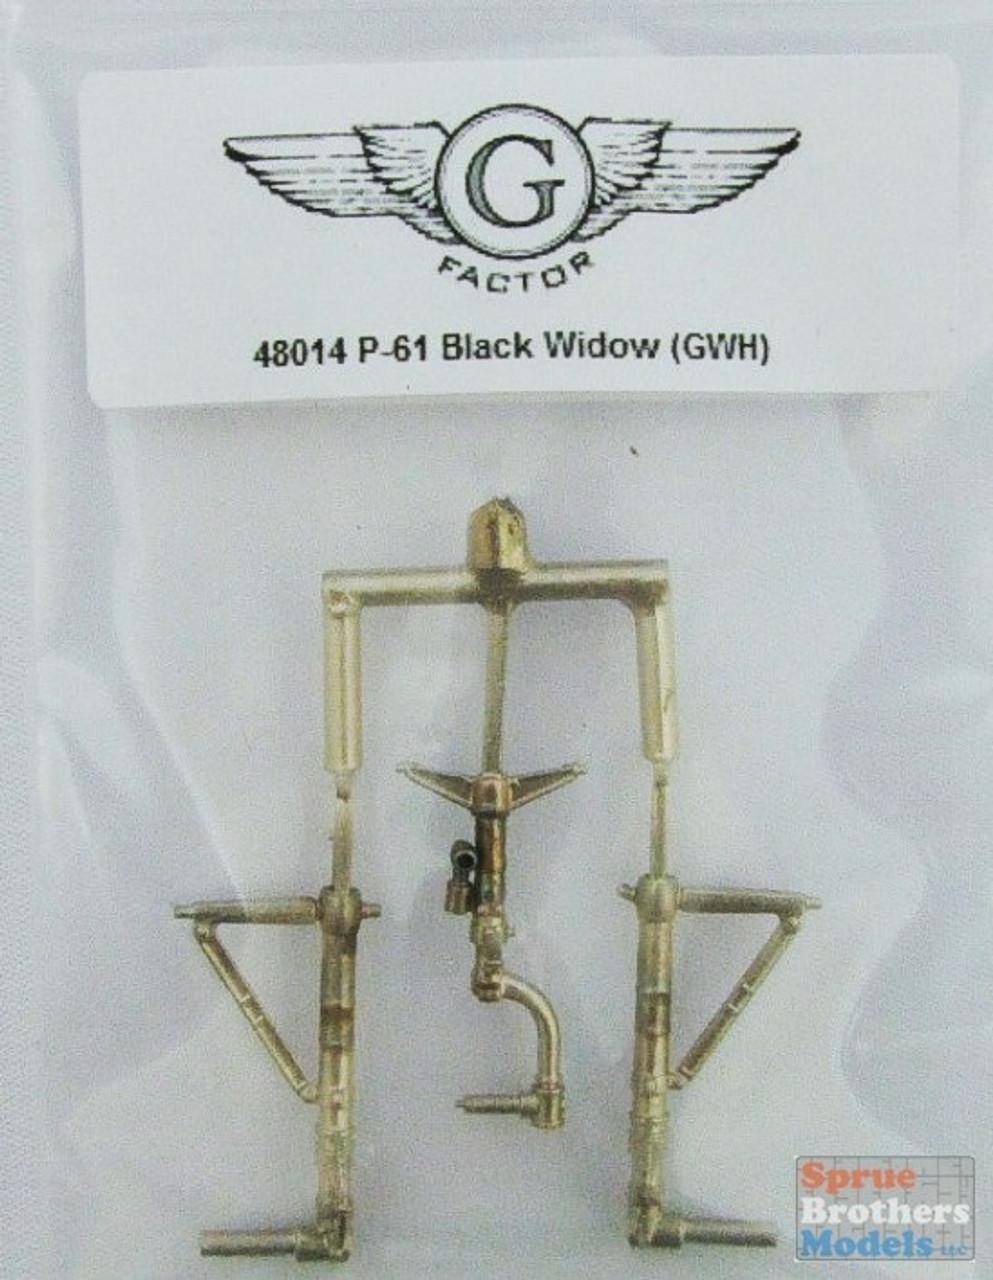 GFM48014 1:48 G-Factor P-61 Black Widow Landing Gear (GWH kit) #48014